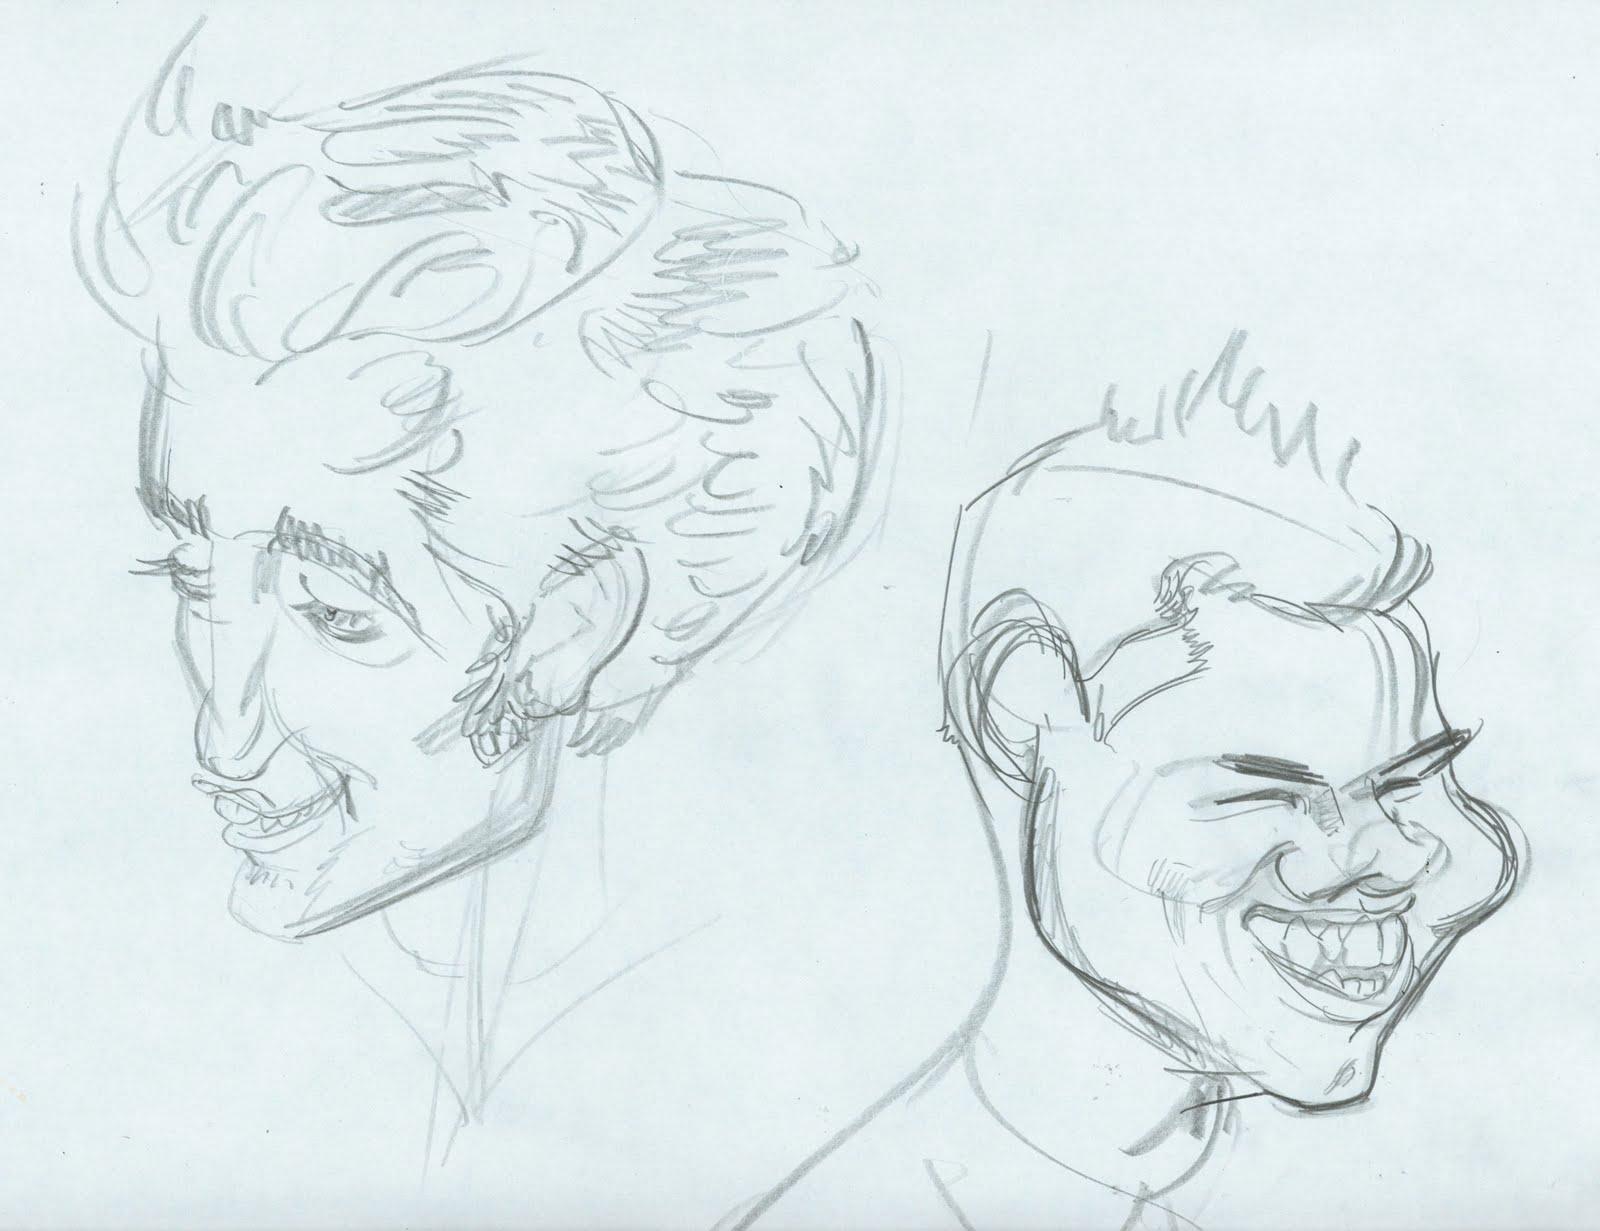 1600x1231 John K Stuff Does All This Human Drawing Help Cartooning